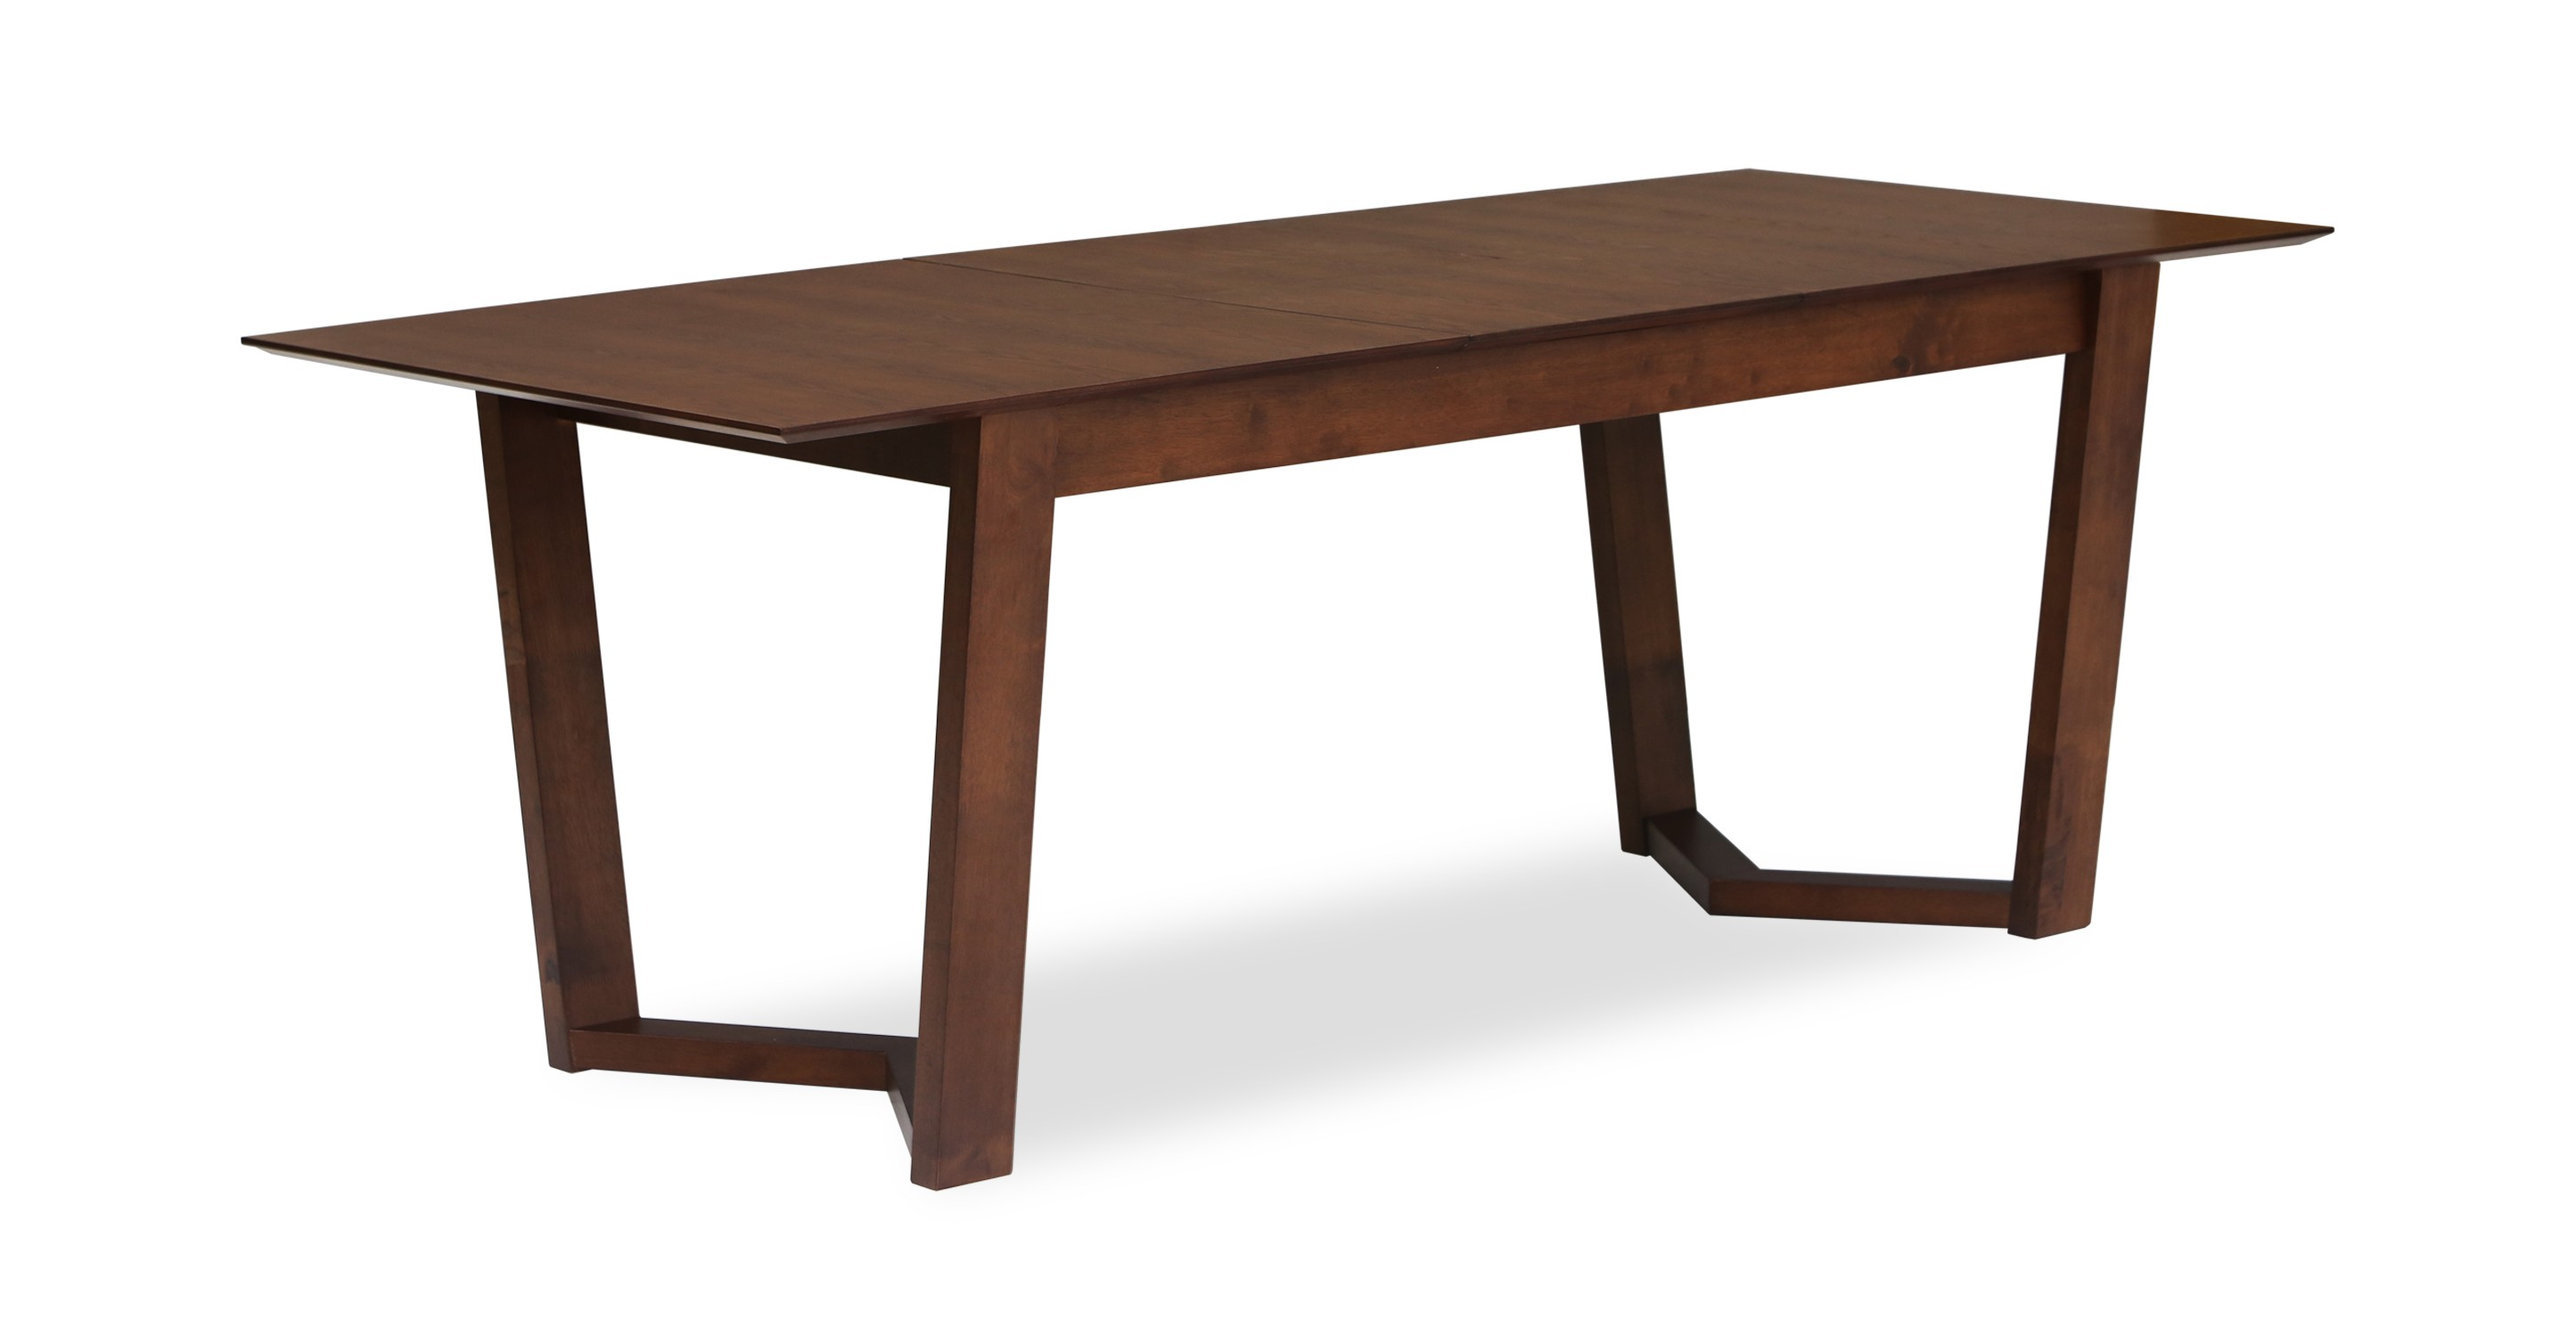 expandable dining tables expandable kitchen table Milo Baughman Expandable Dining Table